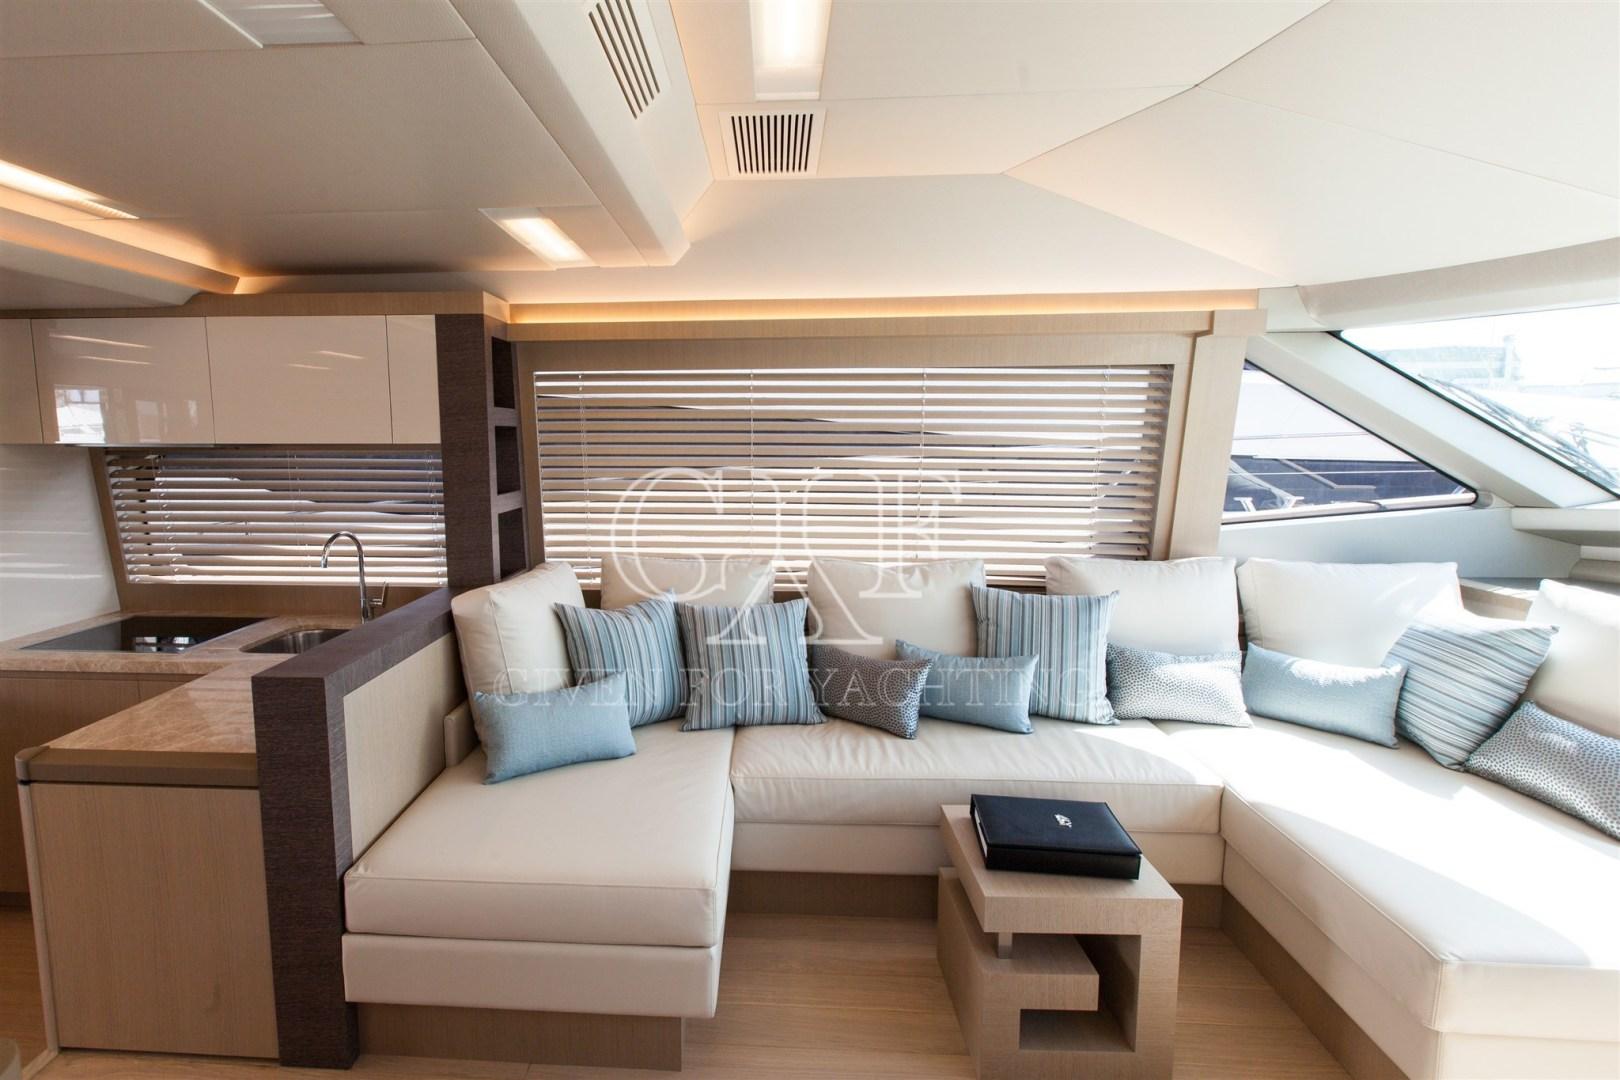 Monte Carlo-MCY 65 2016-EXCALIBUR Varazze-Italy-MCY 65, Salon Lounge Logo-1309584   Thumbnail